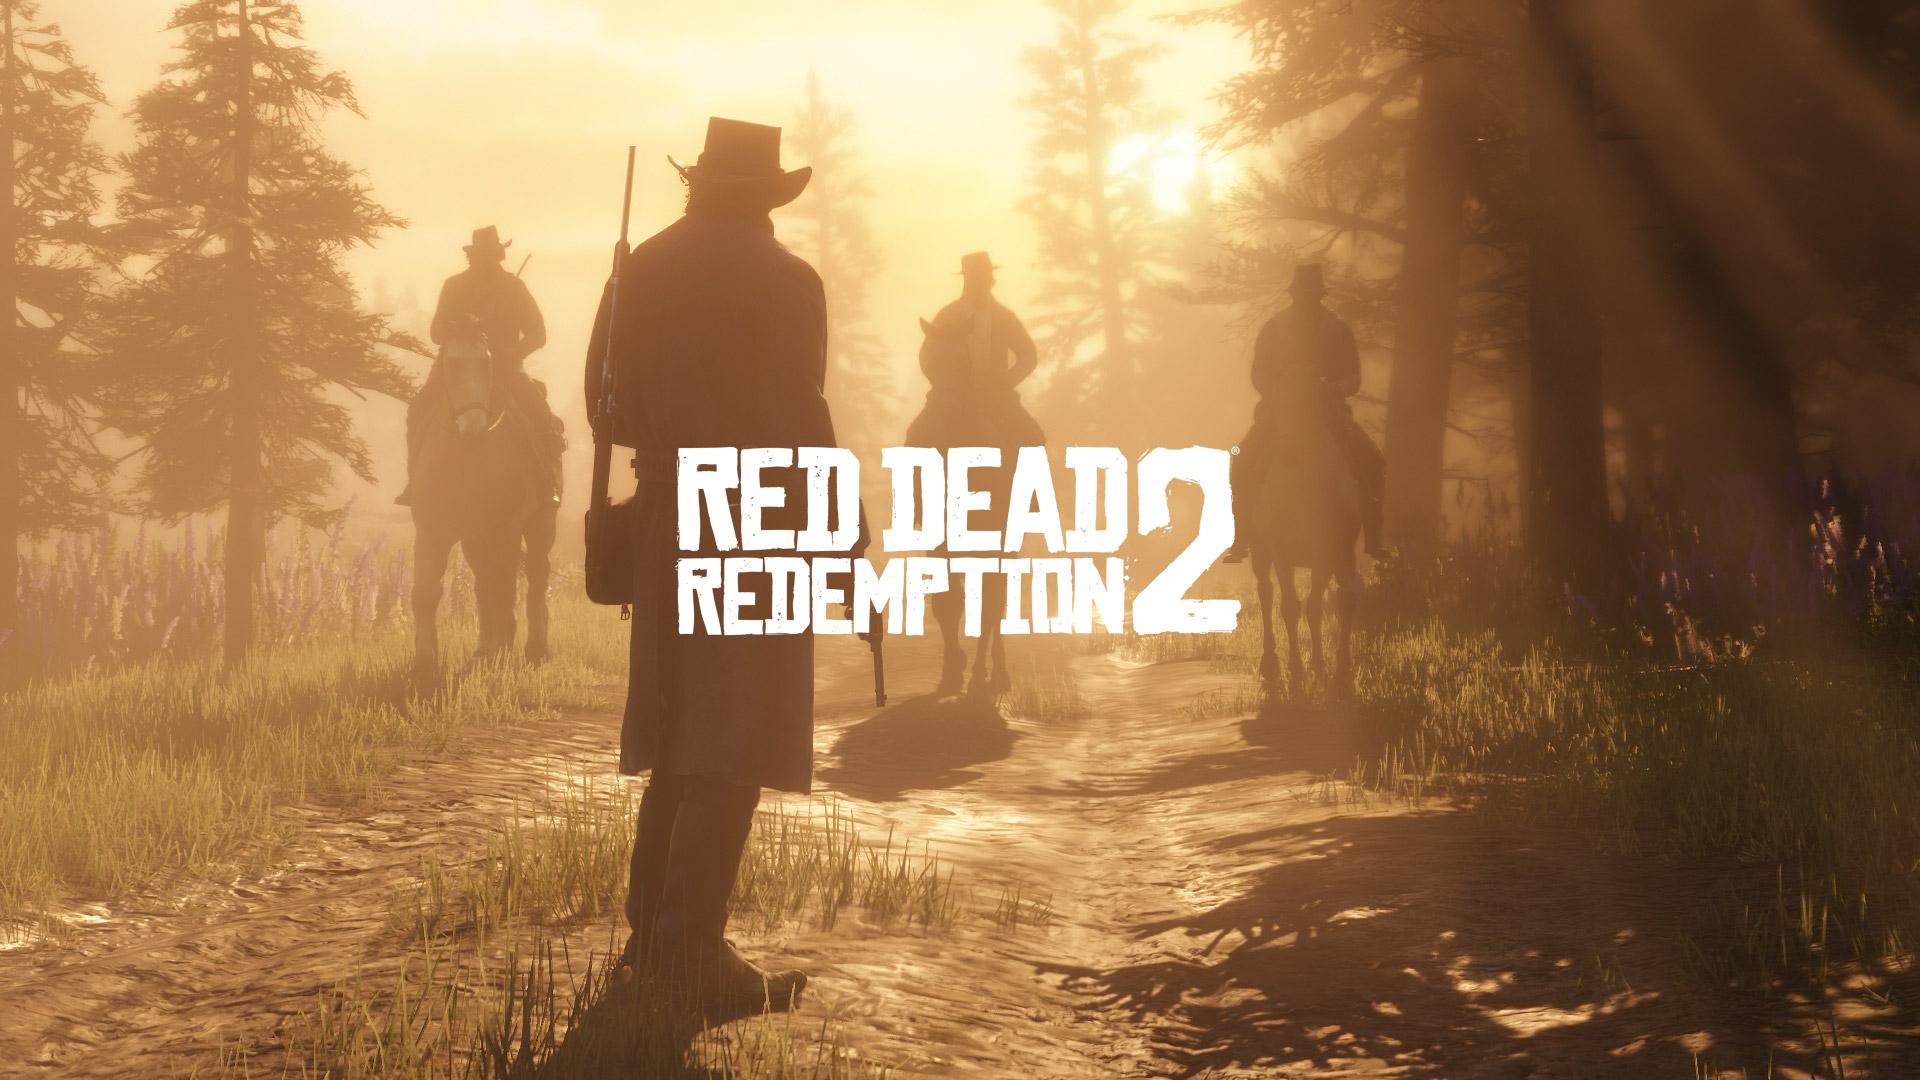 Red Dead Redemption 2 Wallpaper in 1920x1080